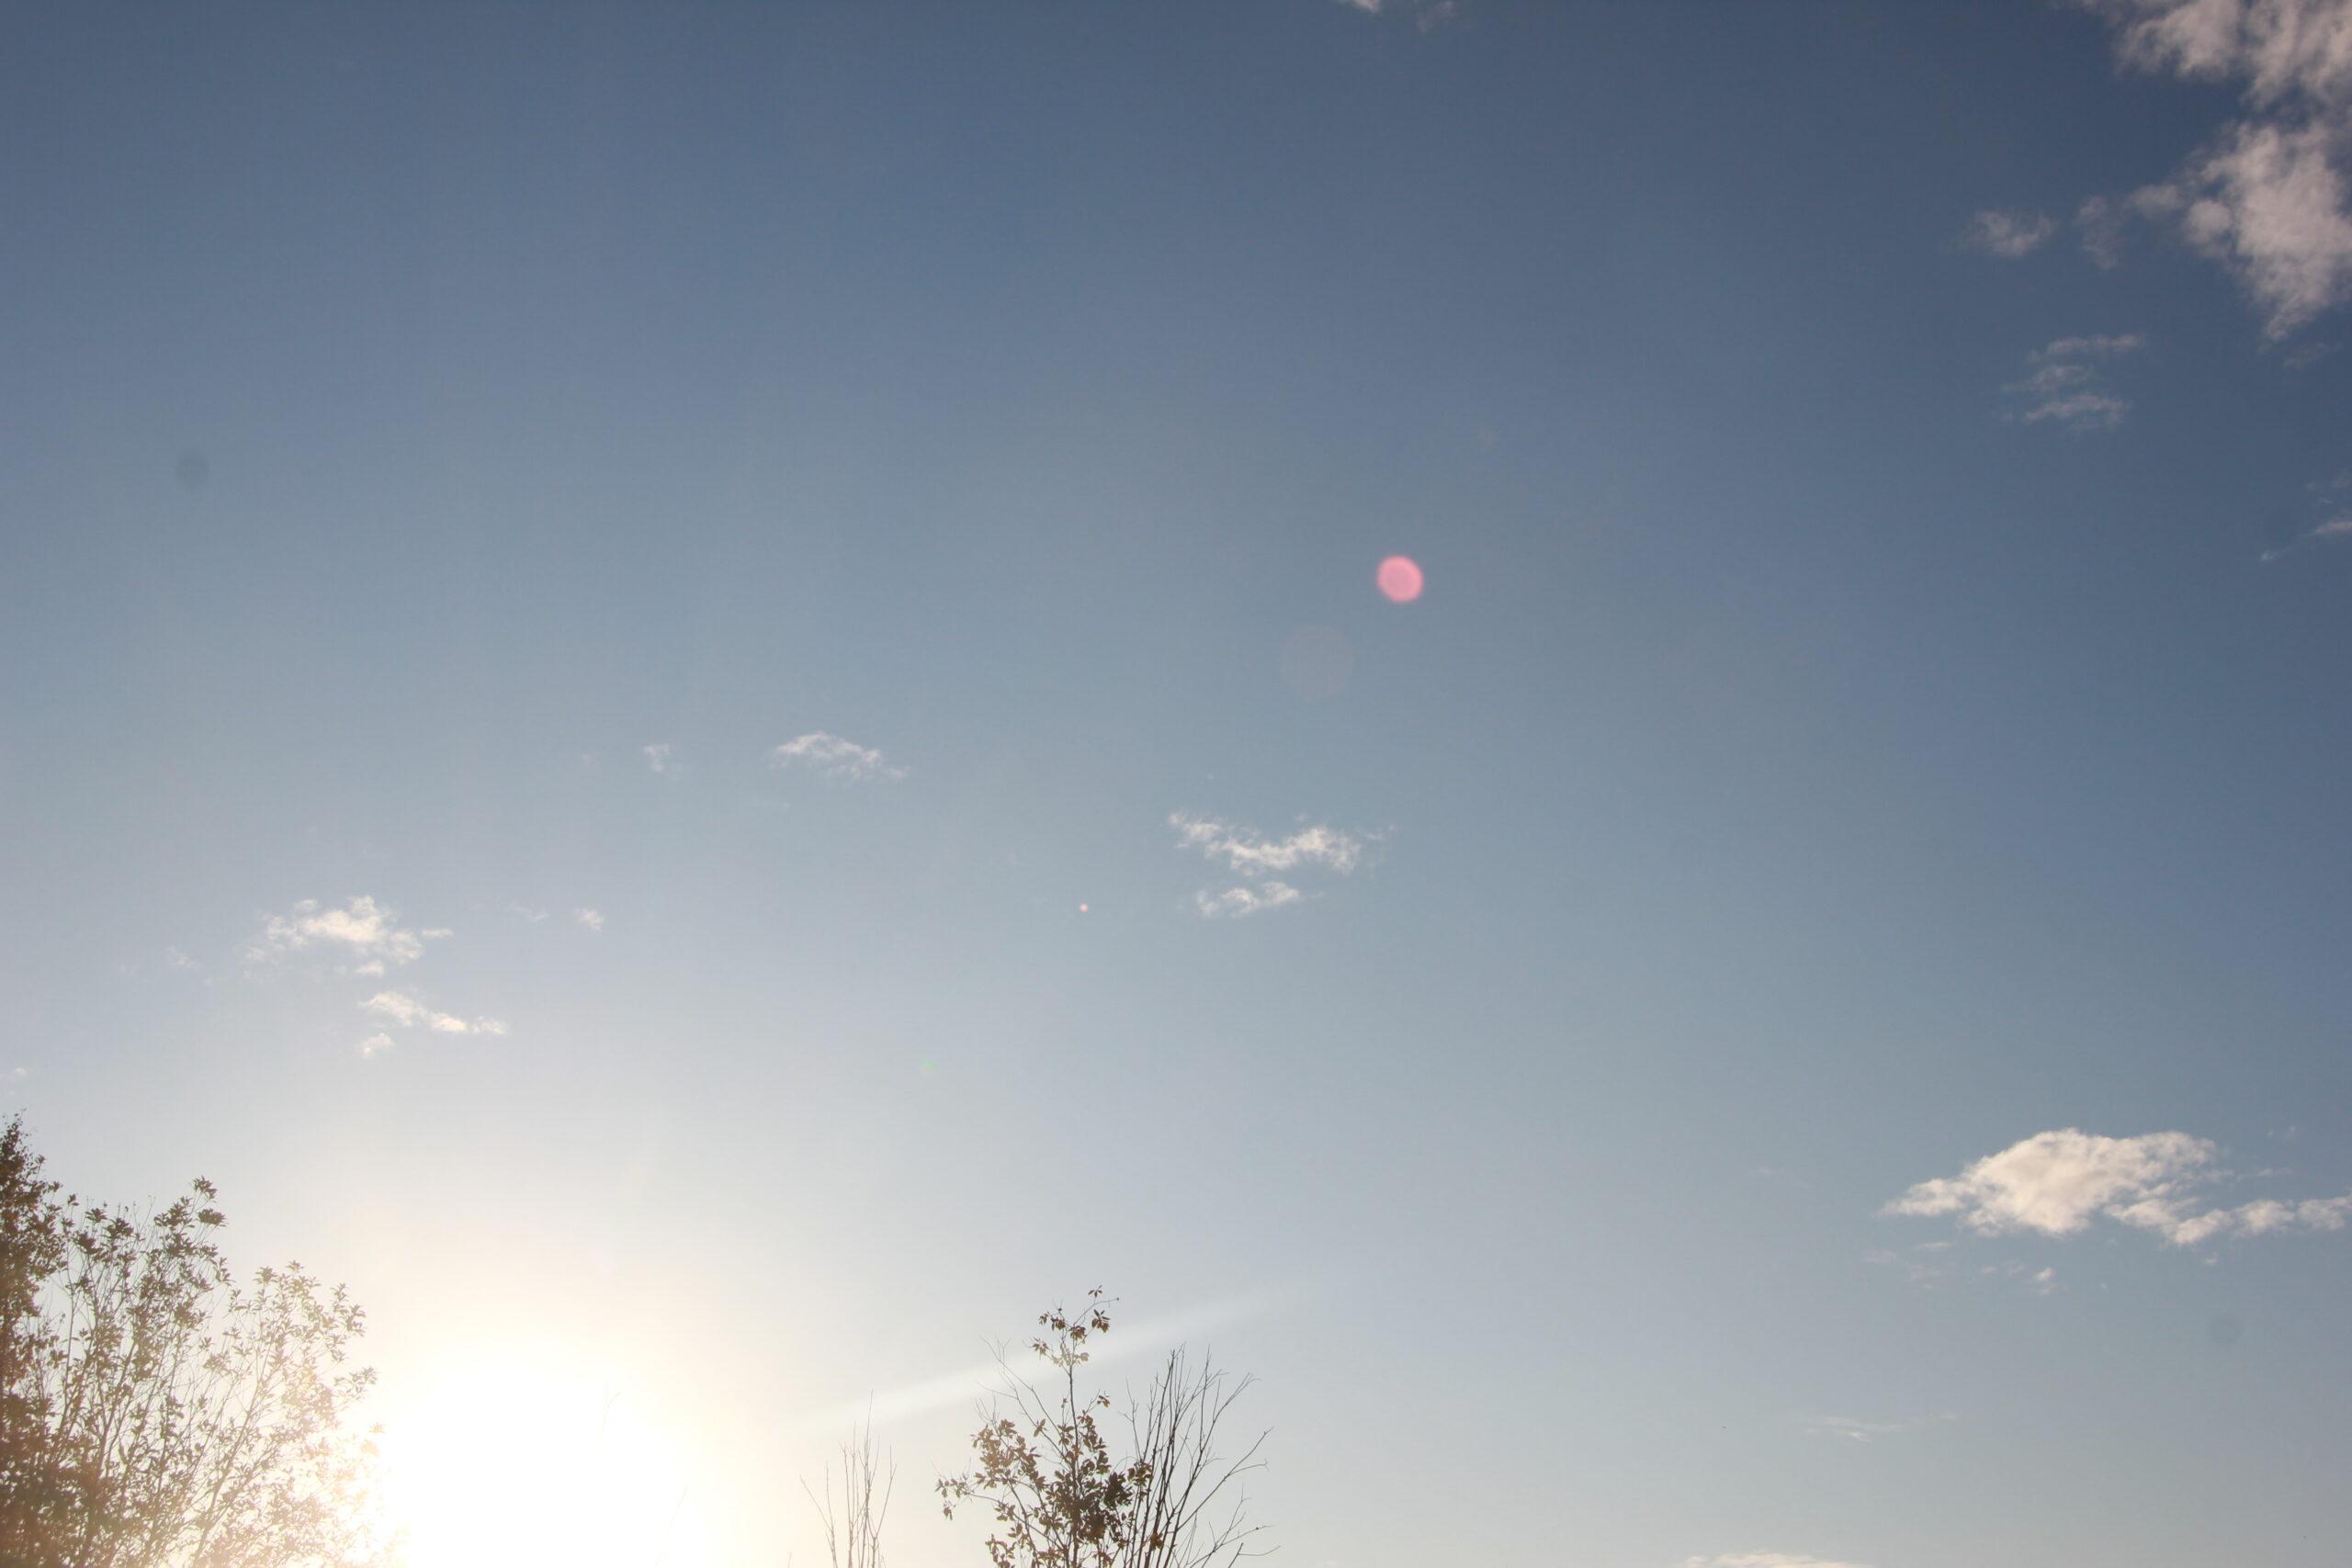 zannee utro voshod 05.09 25